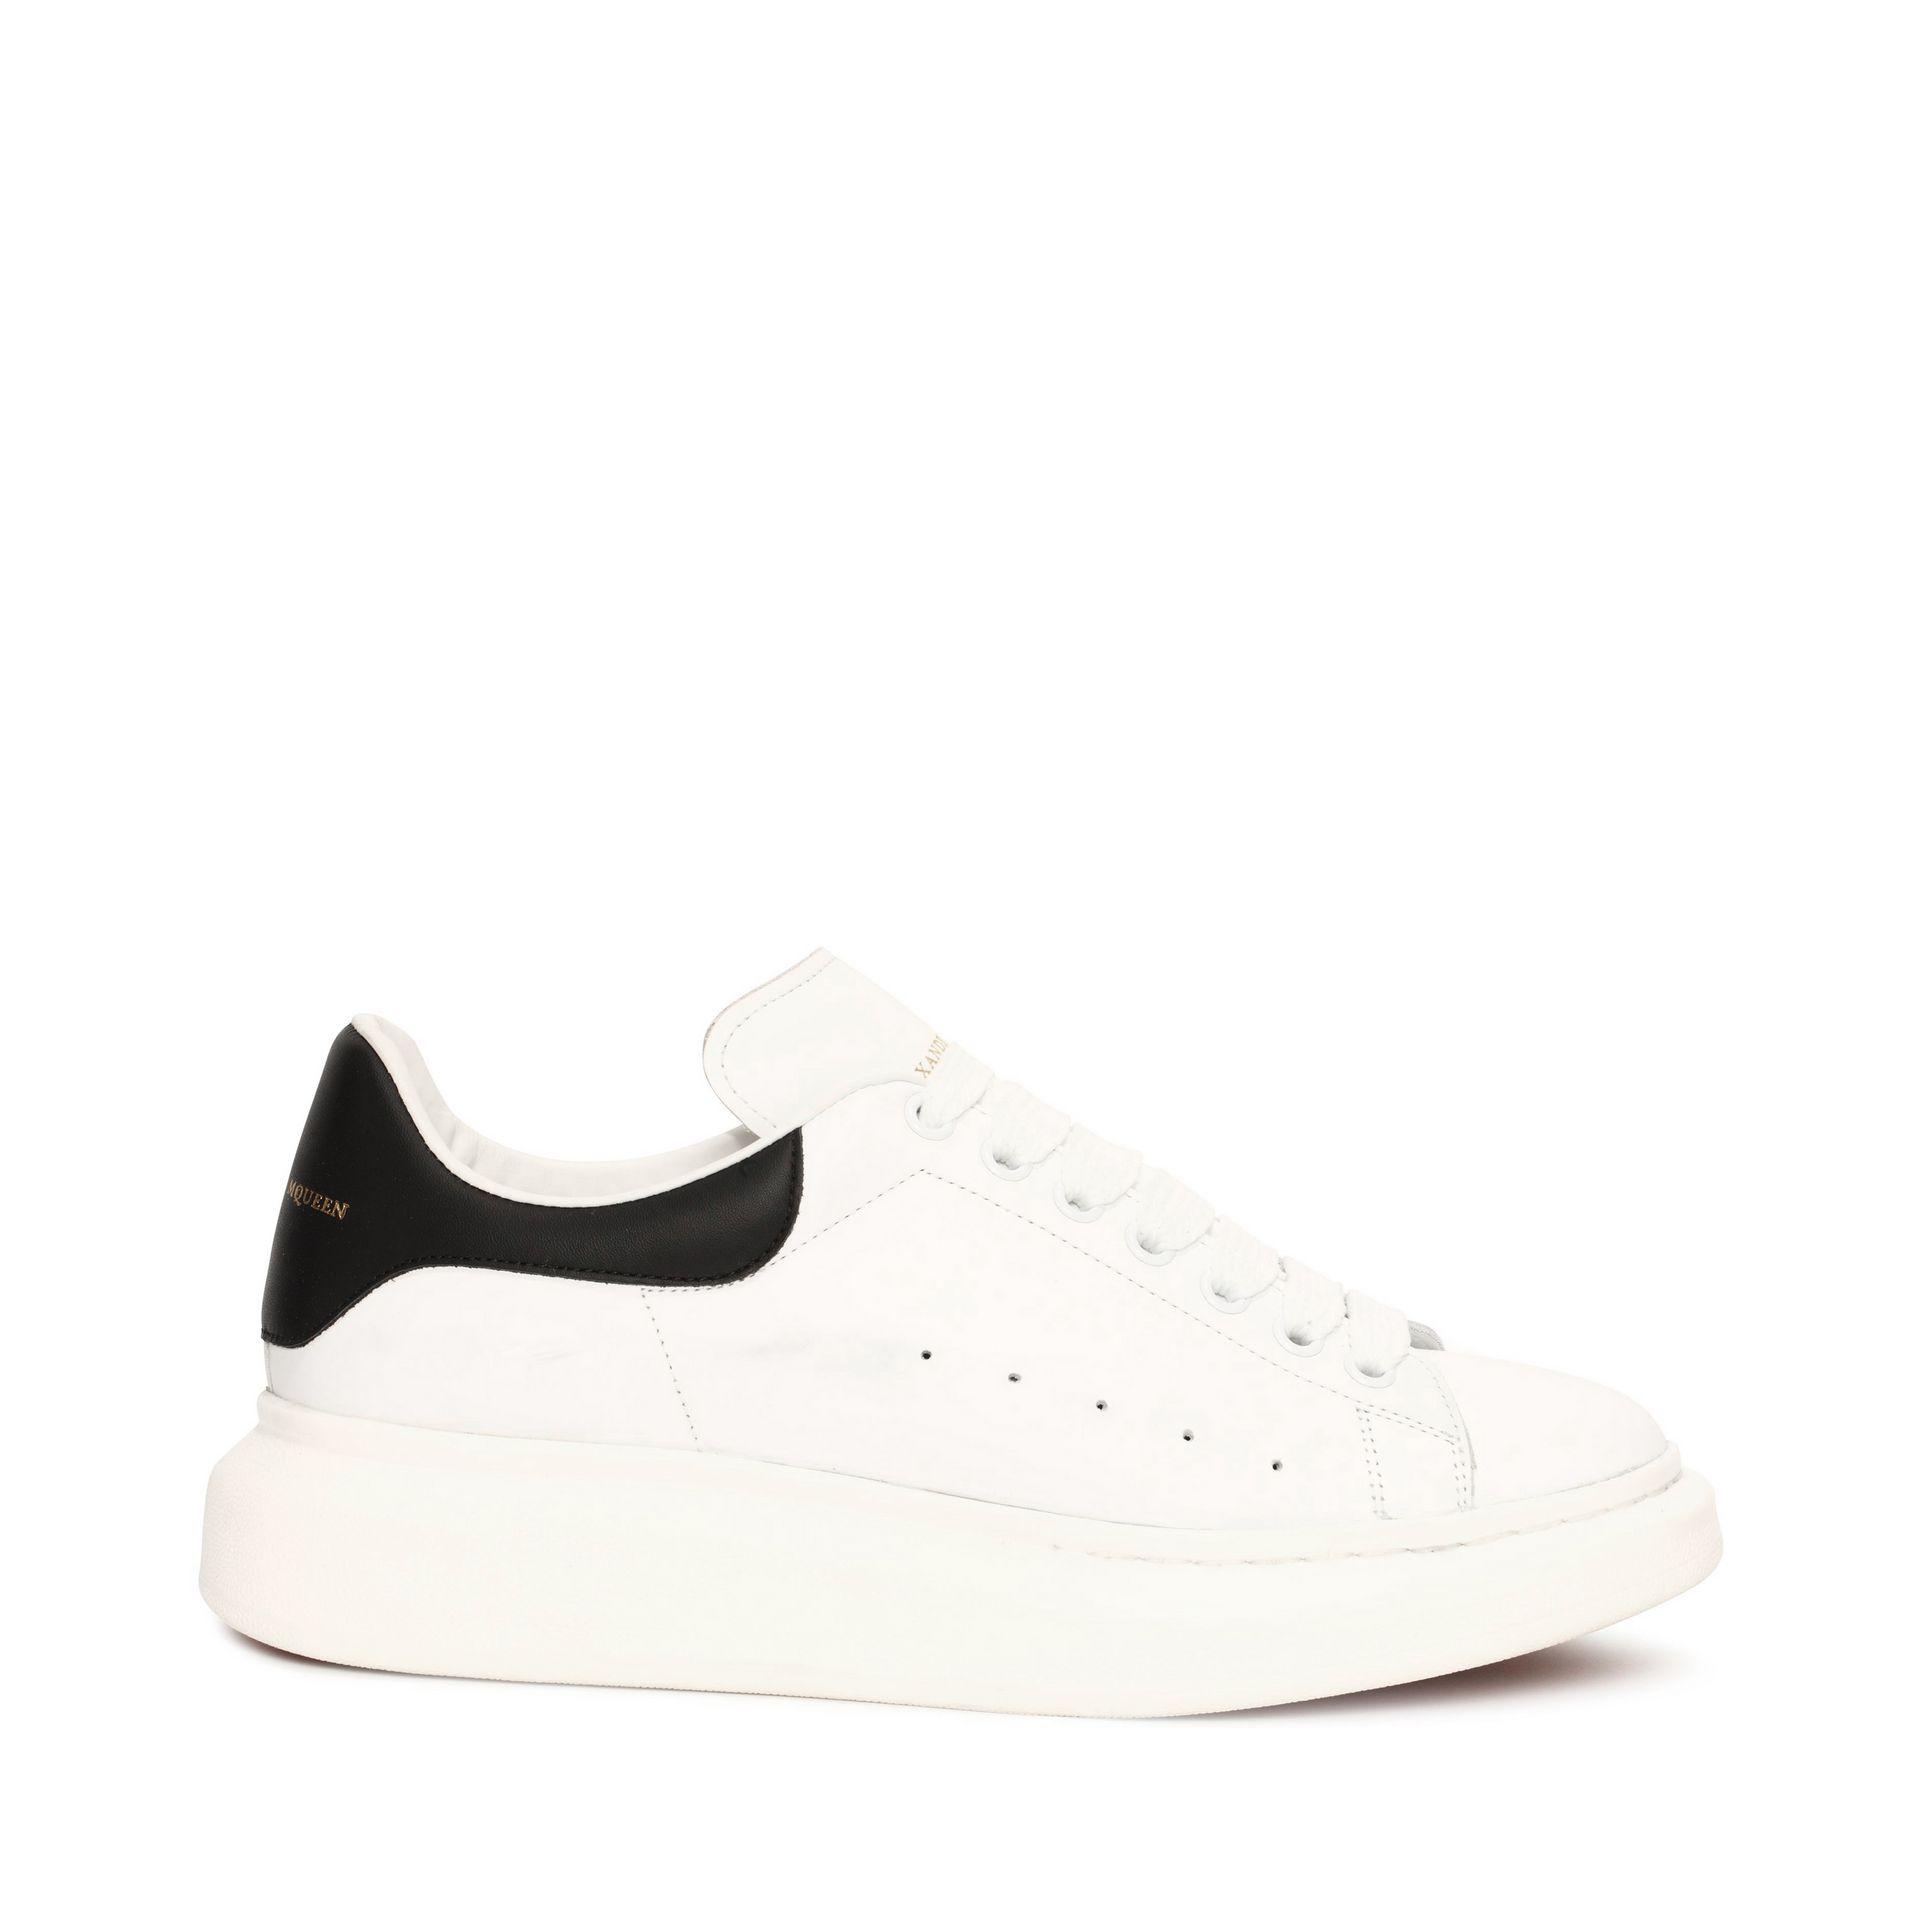 alexander wang shoes sneakers Online